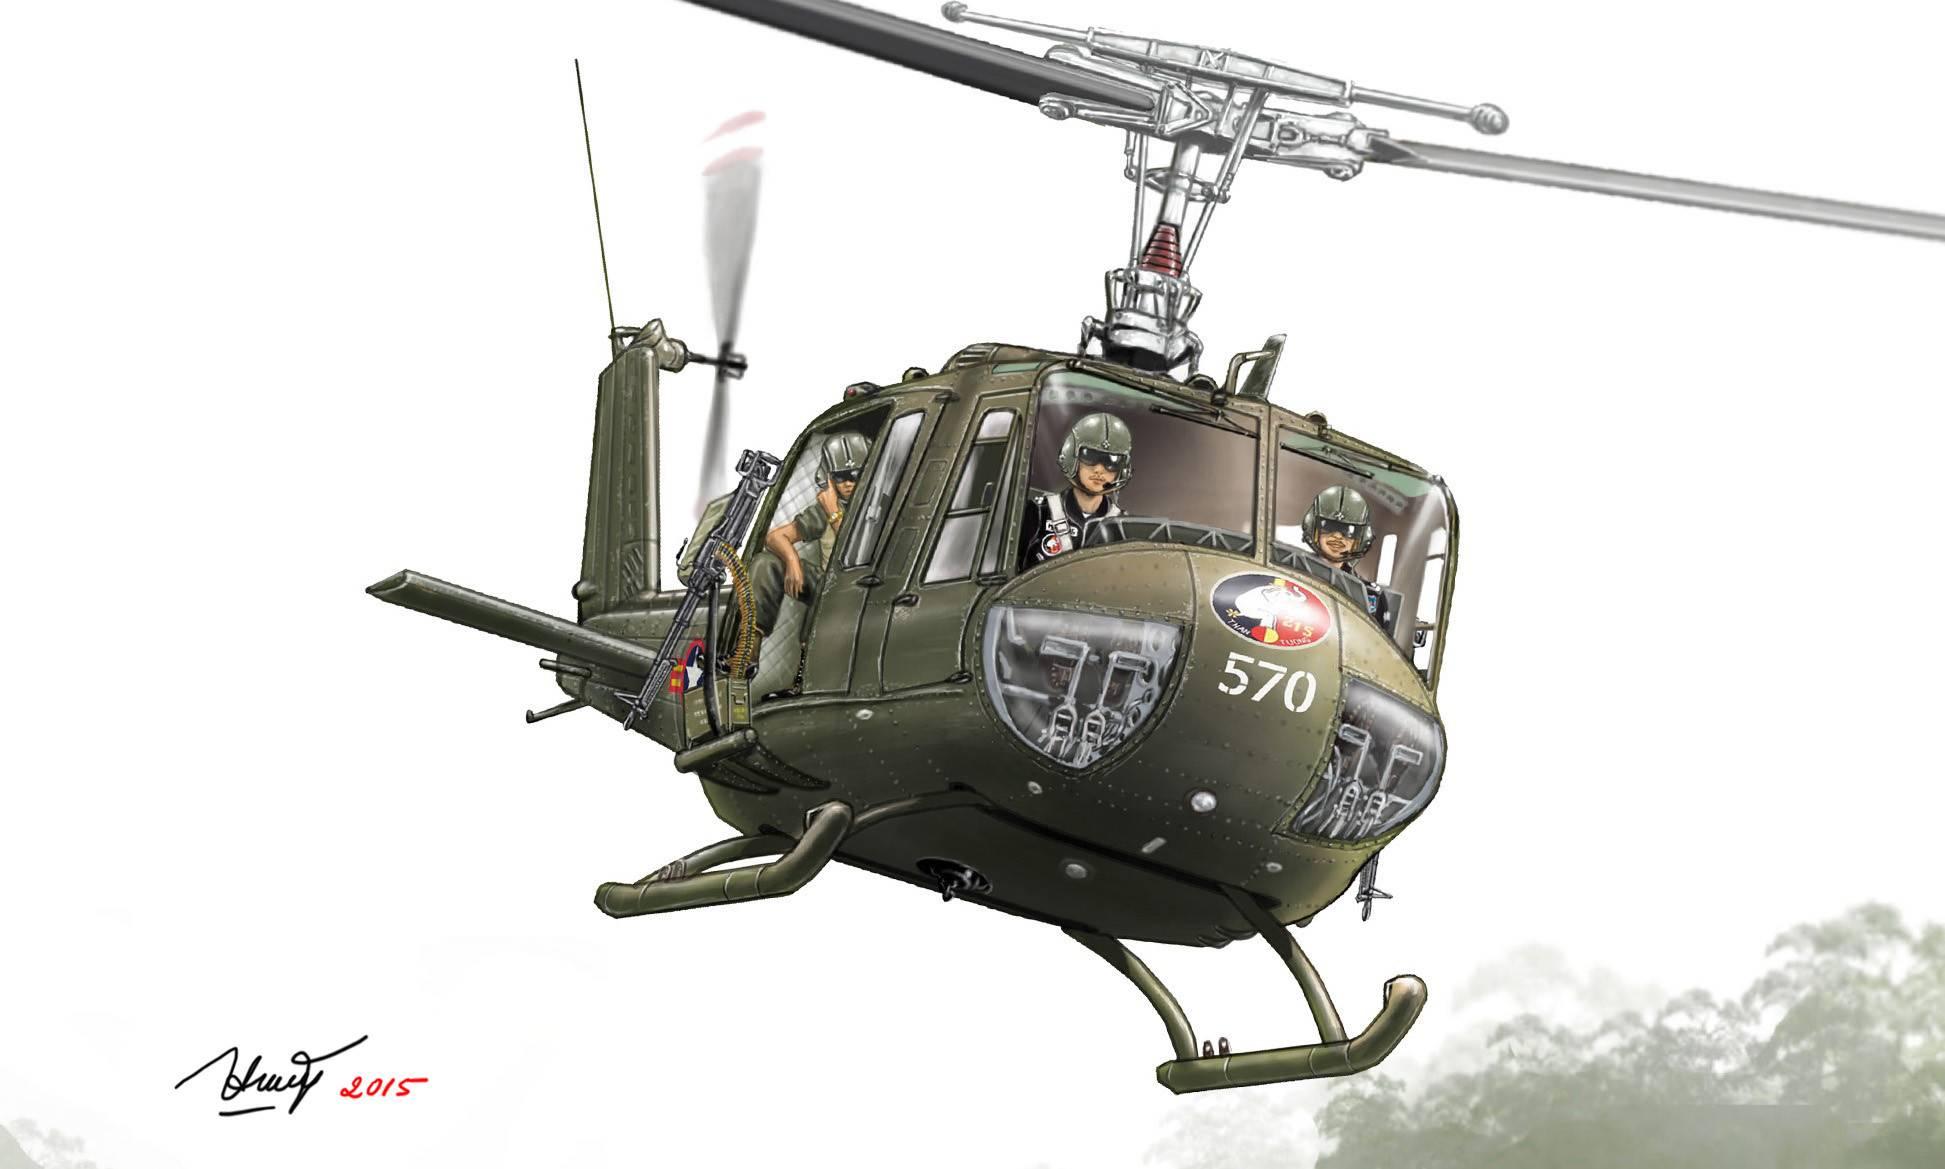 Bell uh-1 ирокез варианты - bell uh-1 iroquois variants